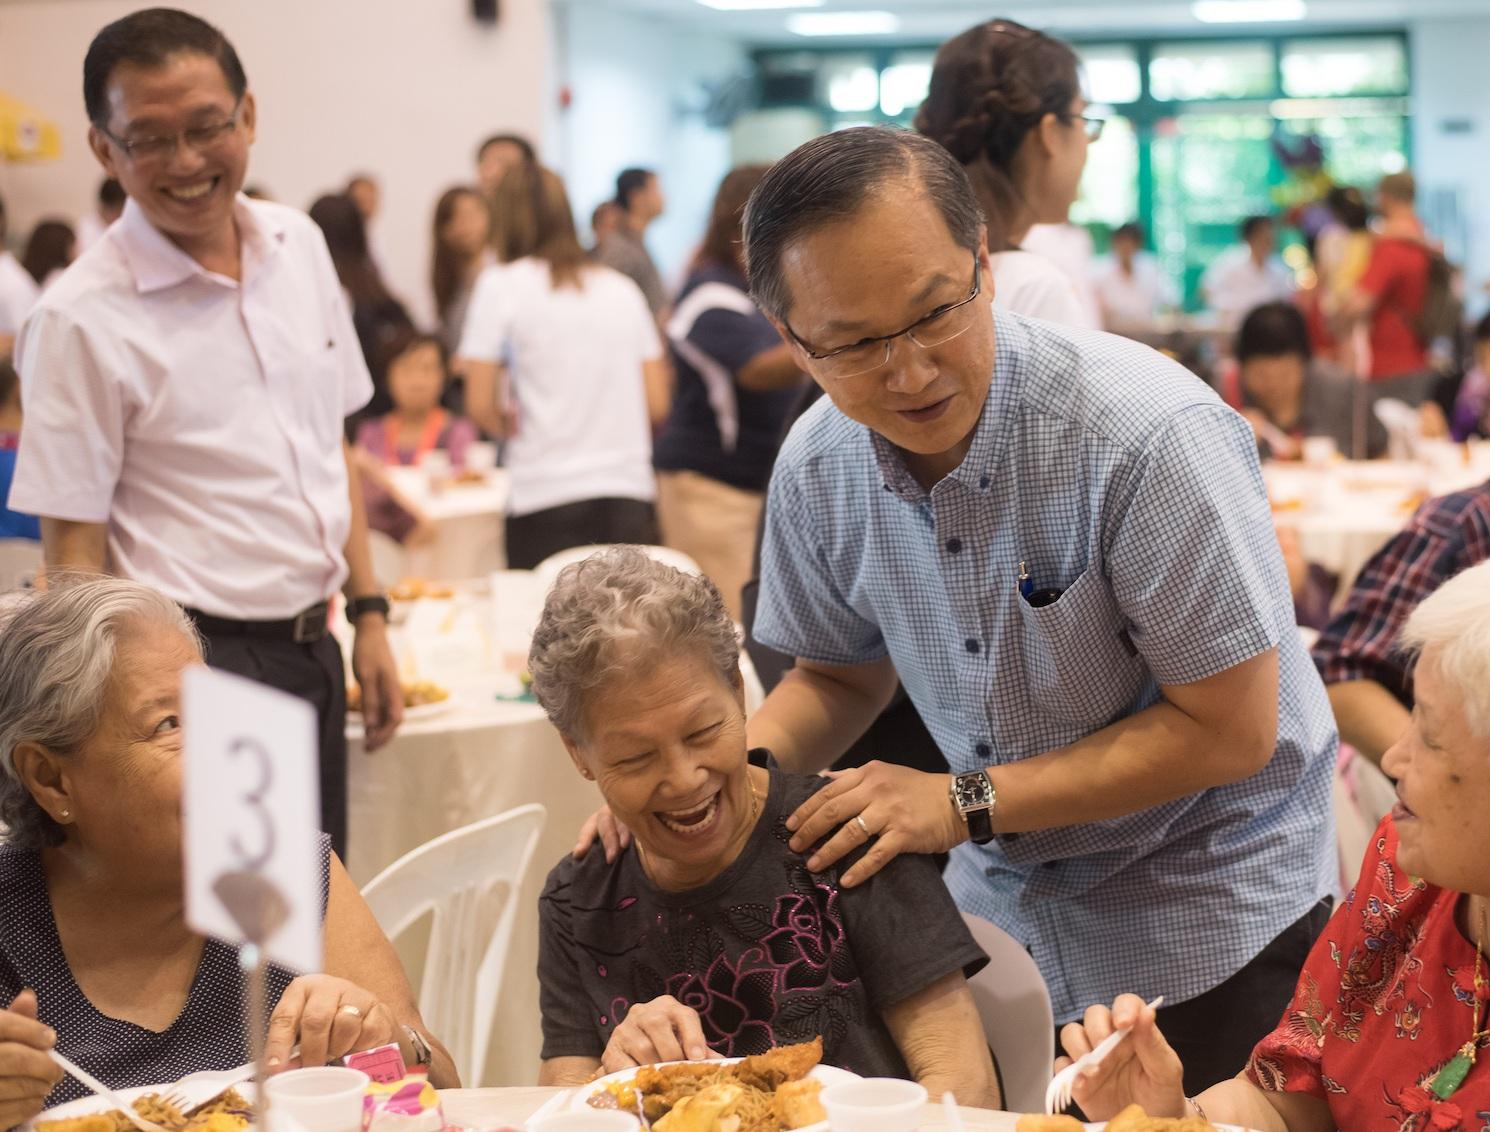 Parent's Day celebration 2016 with Grassroots Advisor, MP Lim Biow Chuan